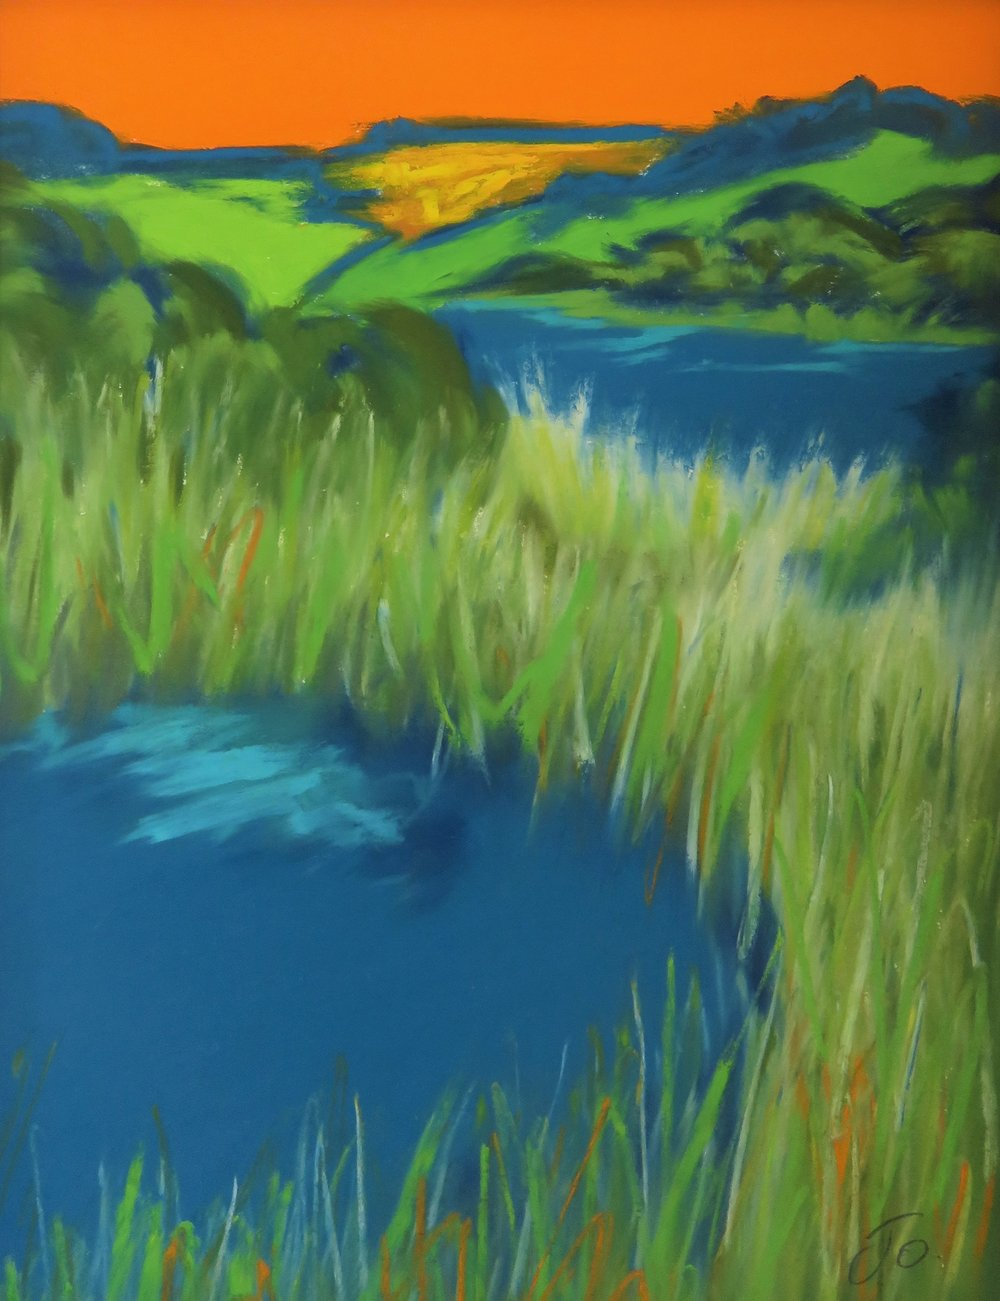 Little Pond - Slapton Ley